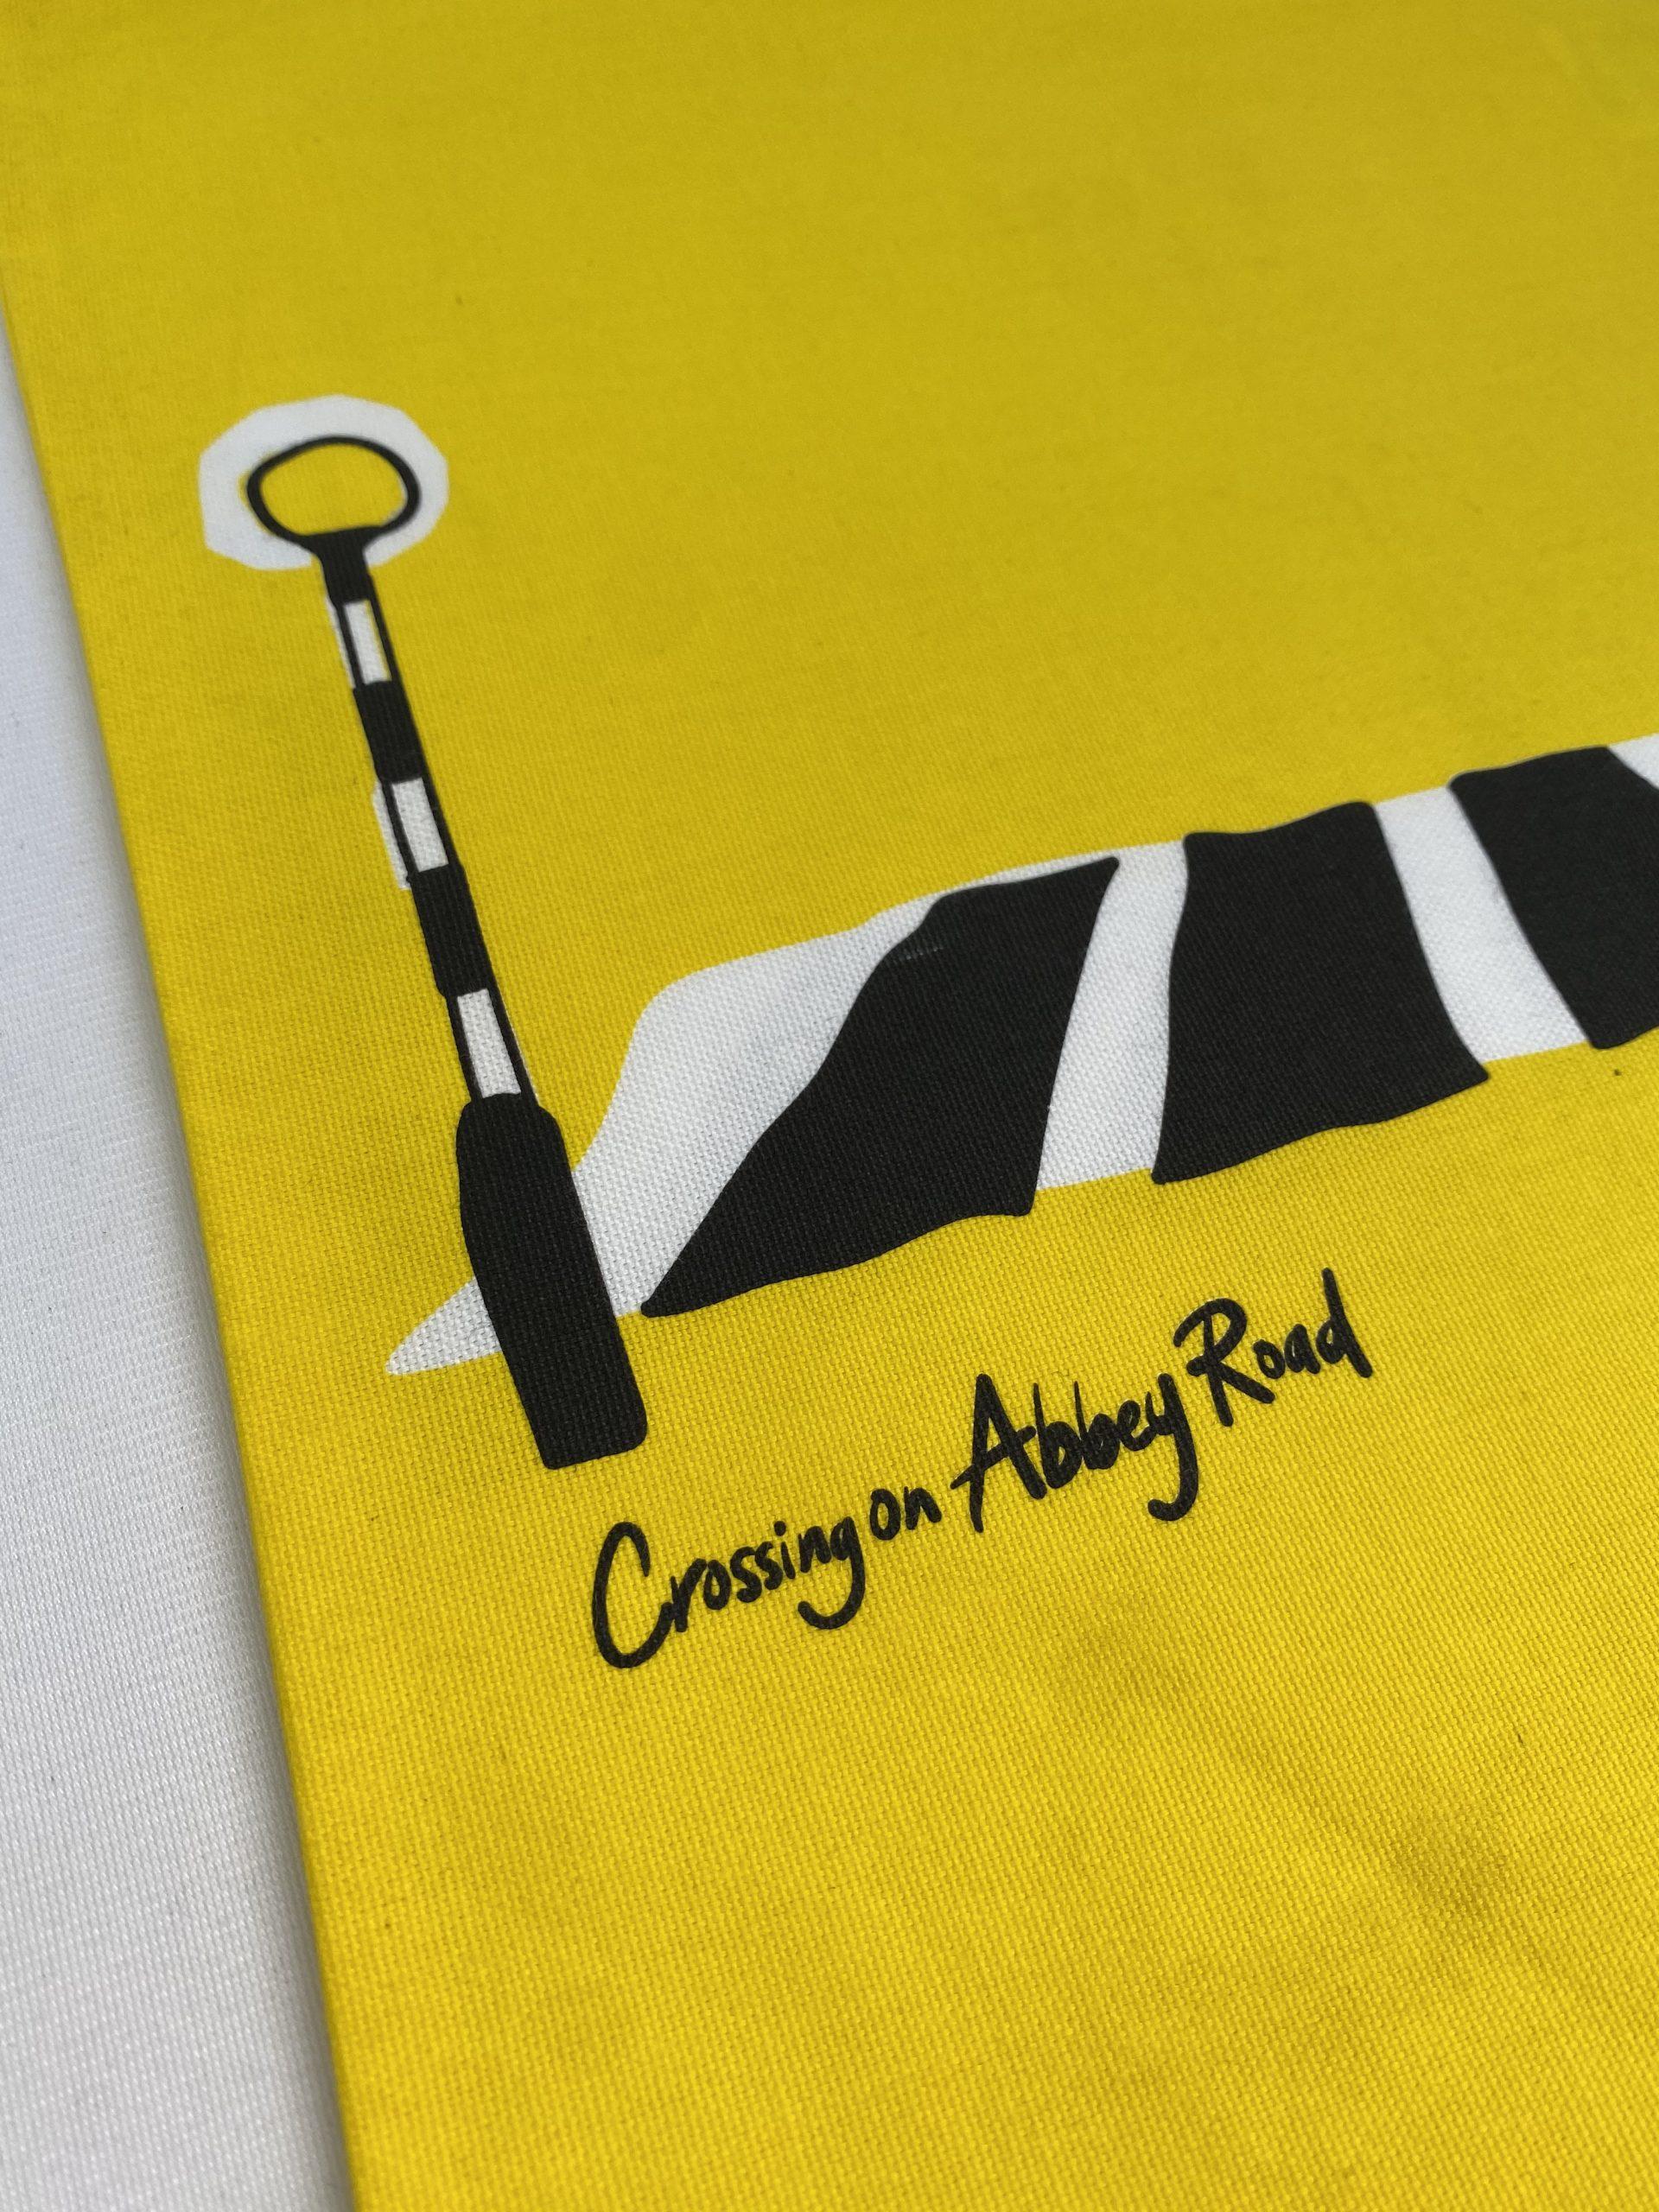 Abbey Road printed textile bag